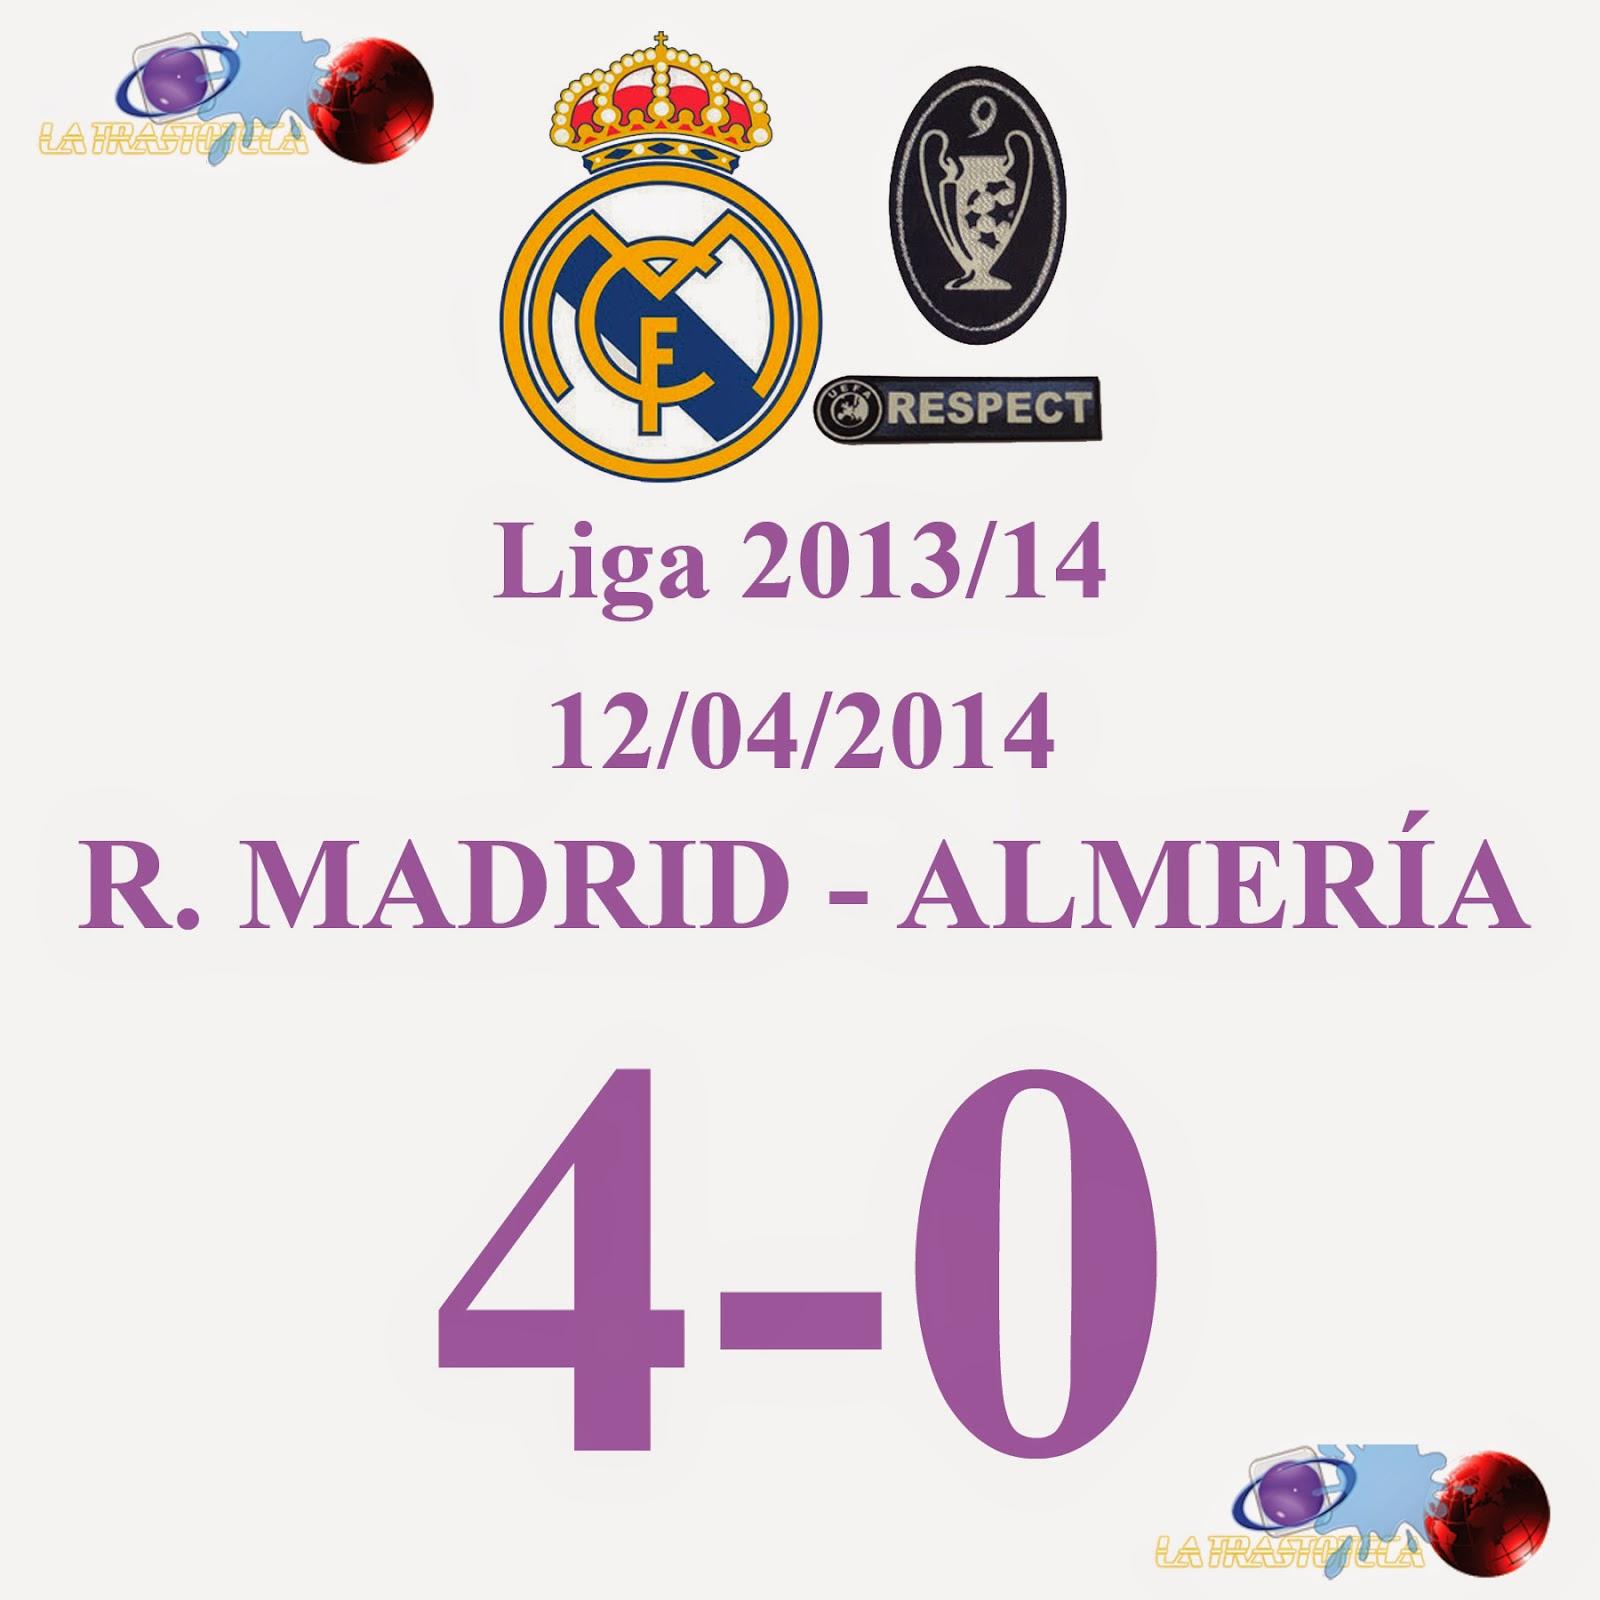 Real Madrid 4 - 0 Almería (Jornada 33) - 12/04/2014